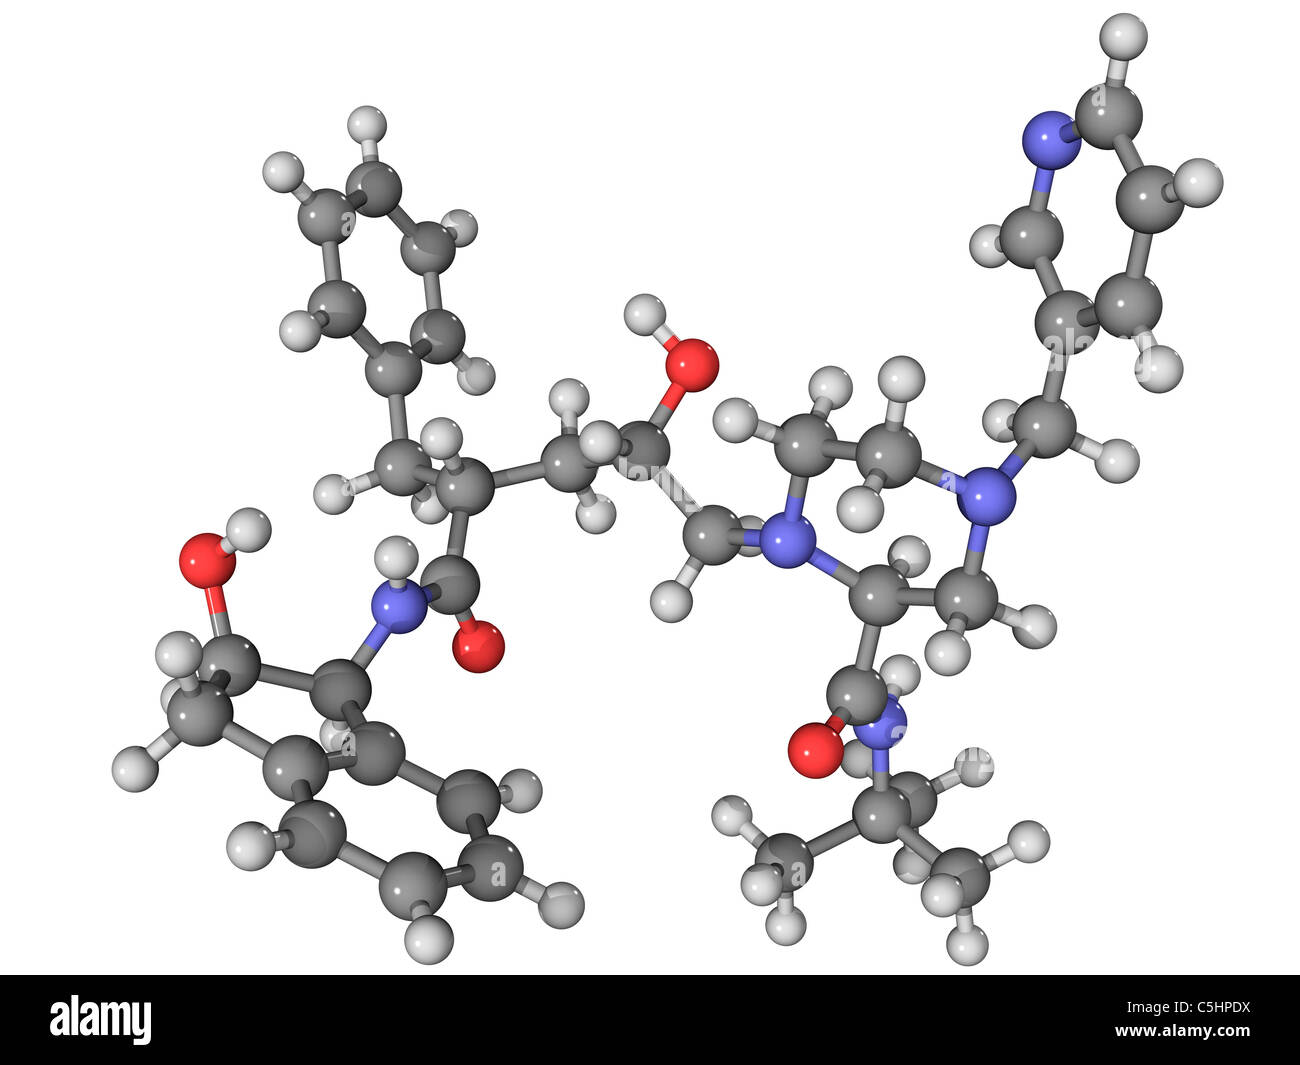 diclofenac 75 mg lp